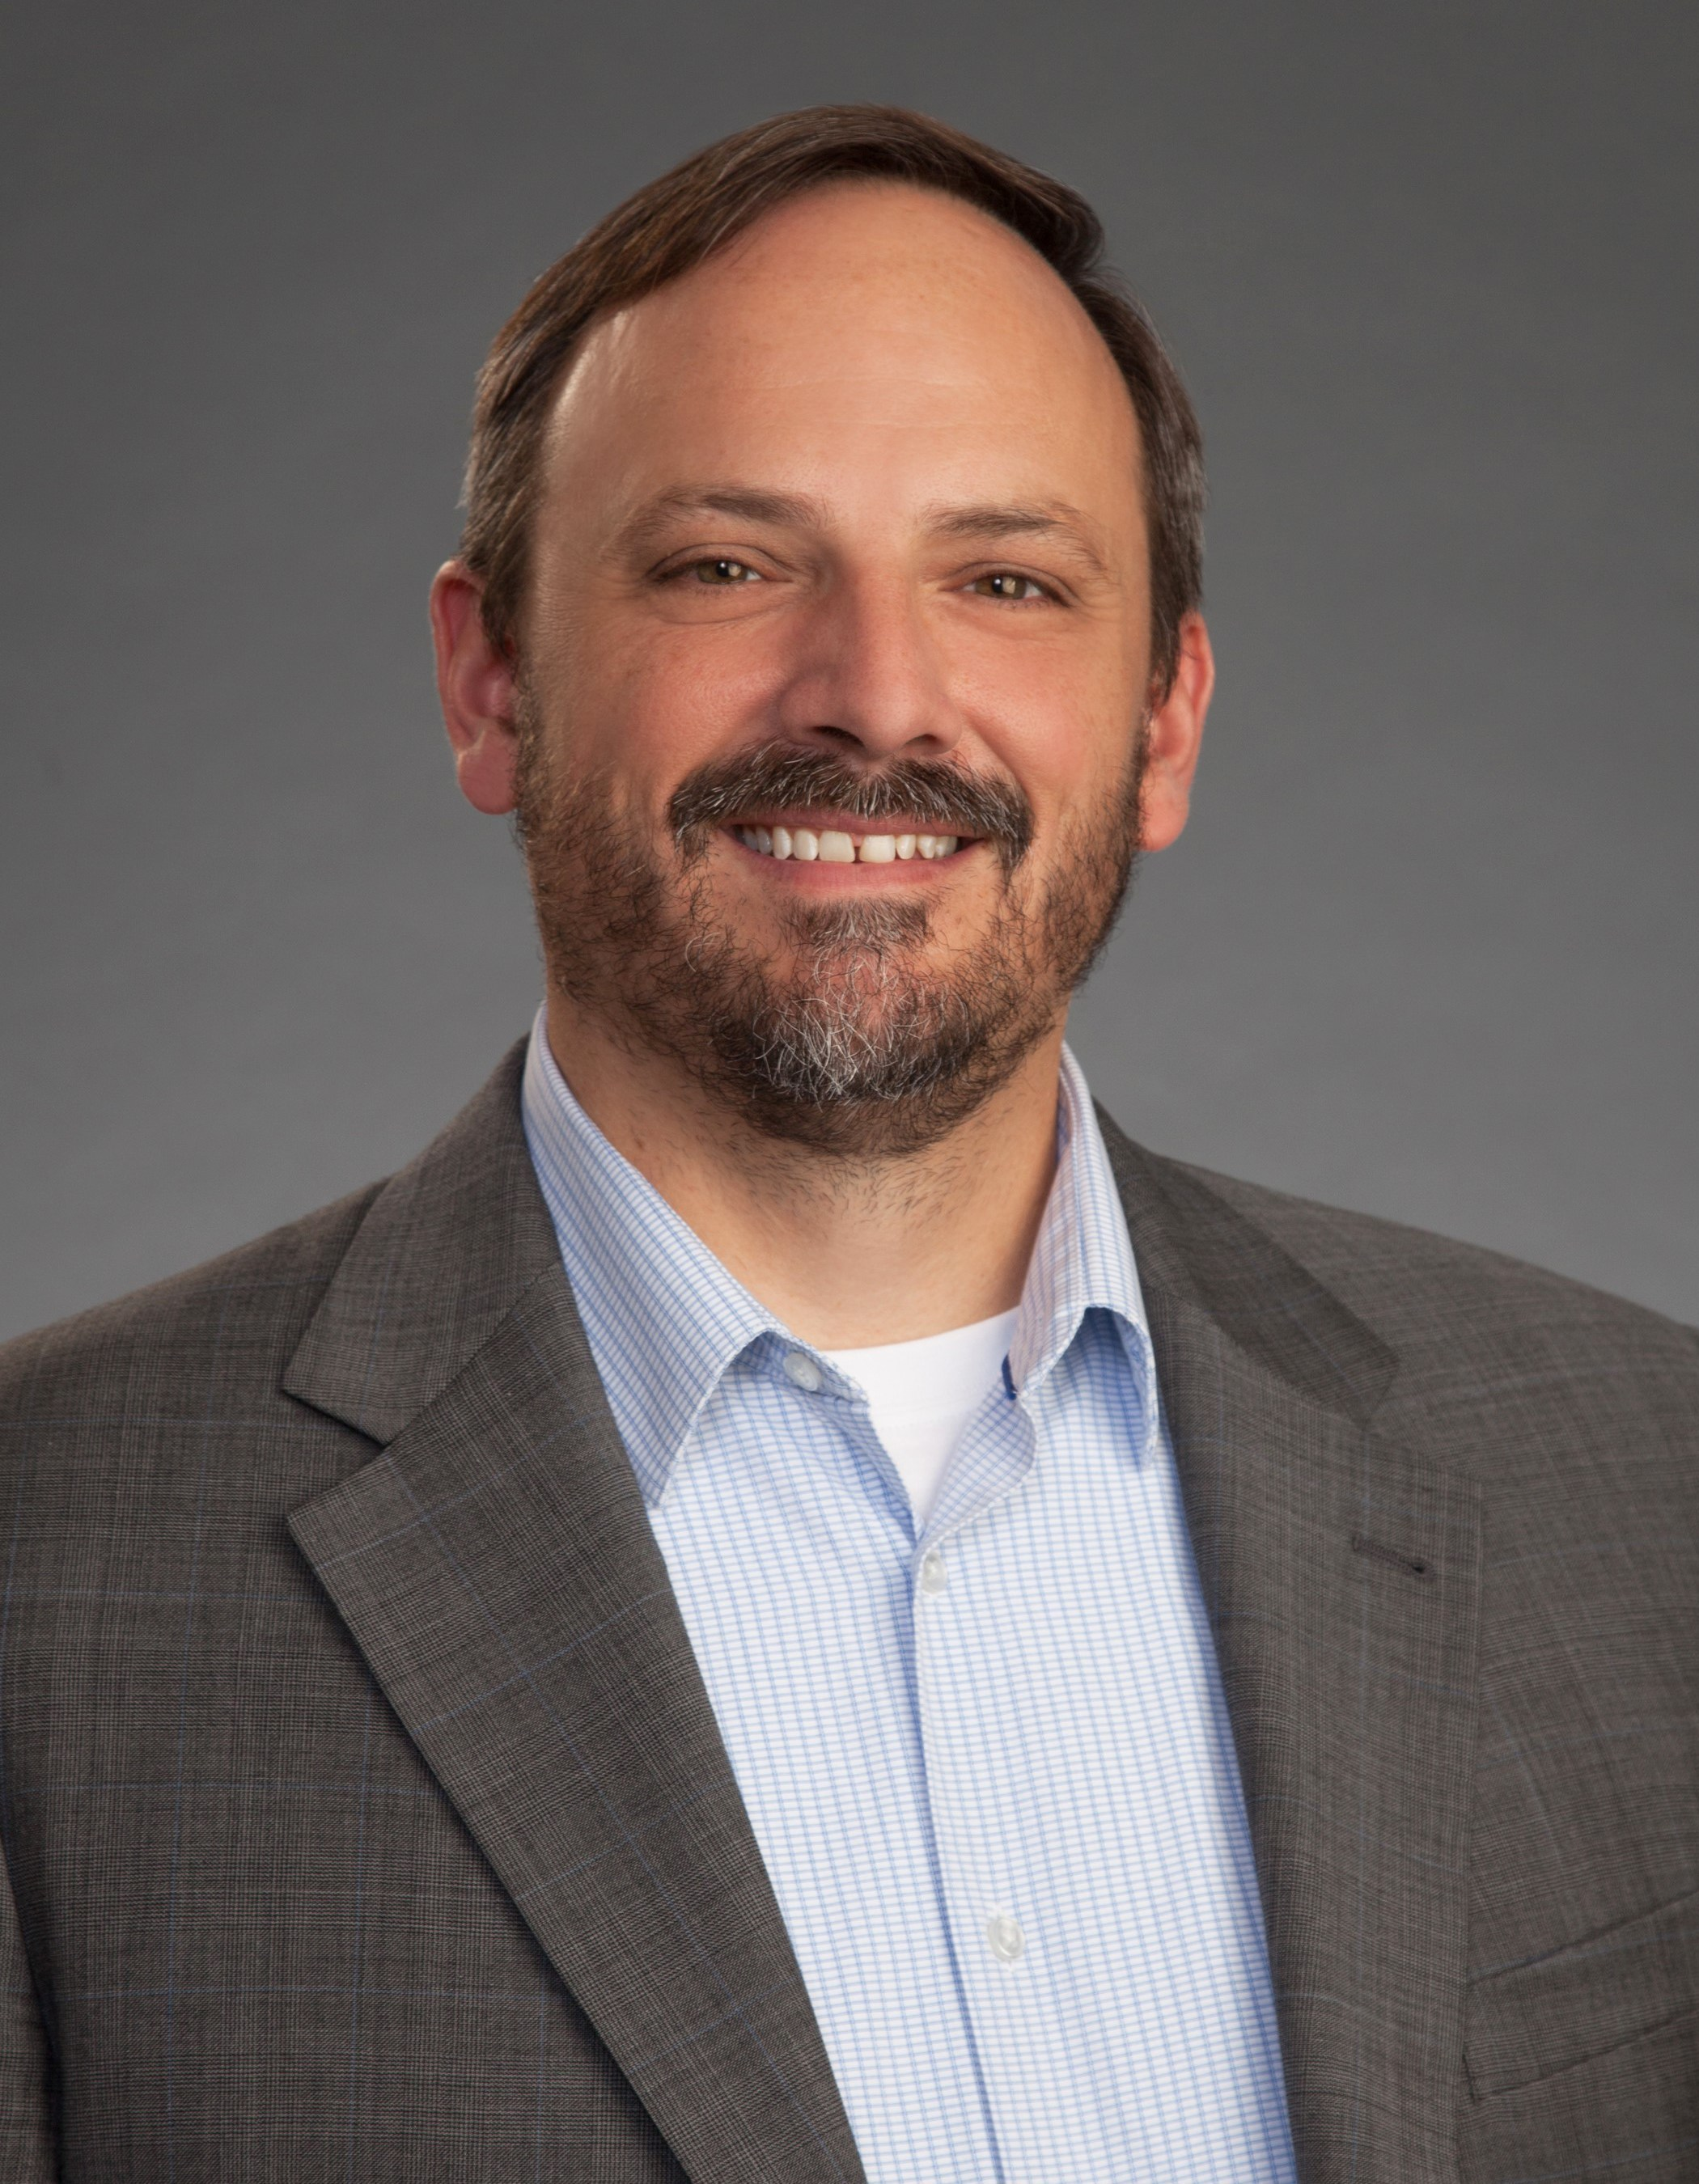 JCA Promotes Matt Cooper to President